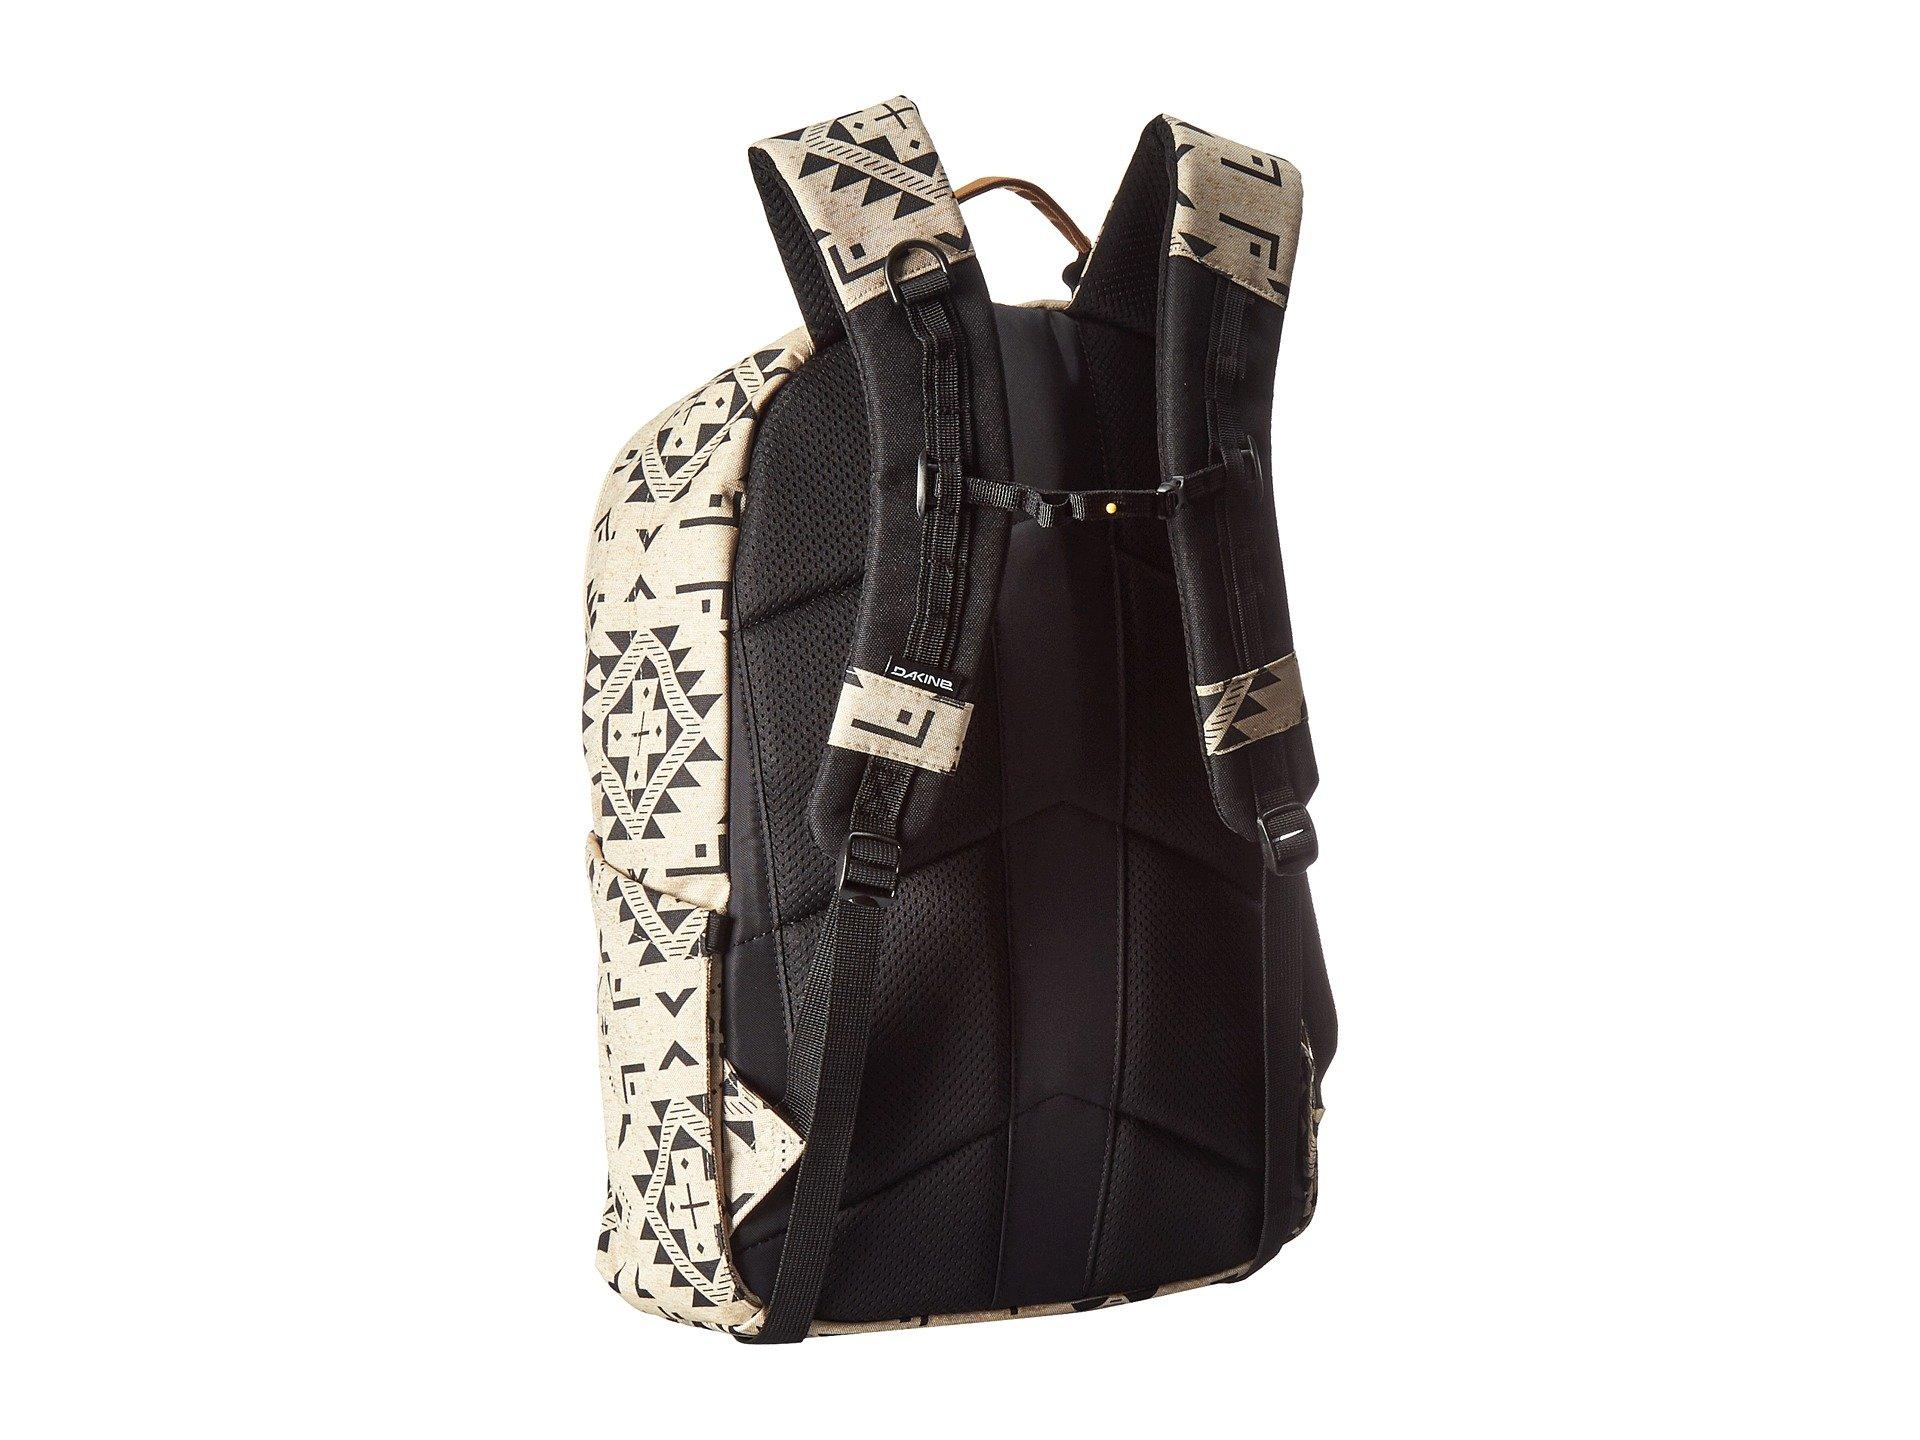 Dakine Alexa Backpack Backpack Alexa 24l Dakine 24l Silverton wqPUt4x